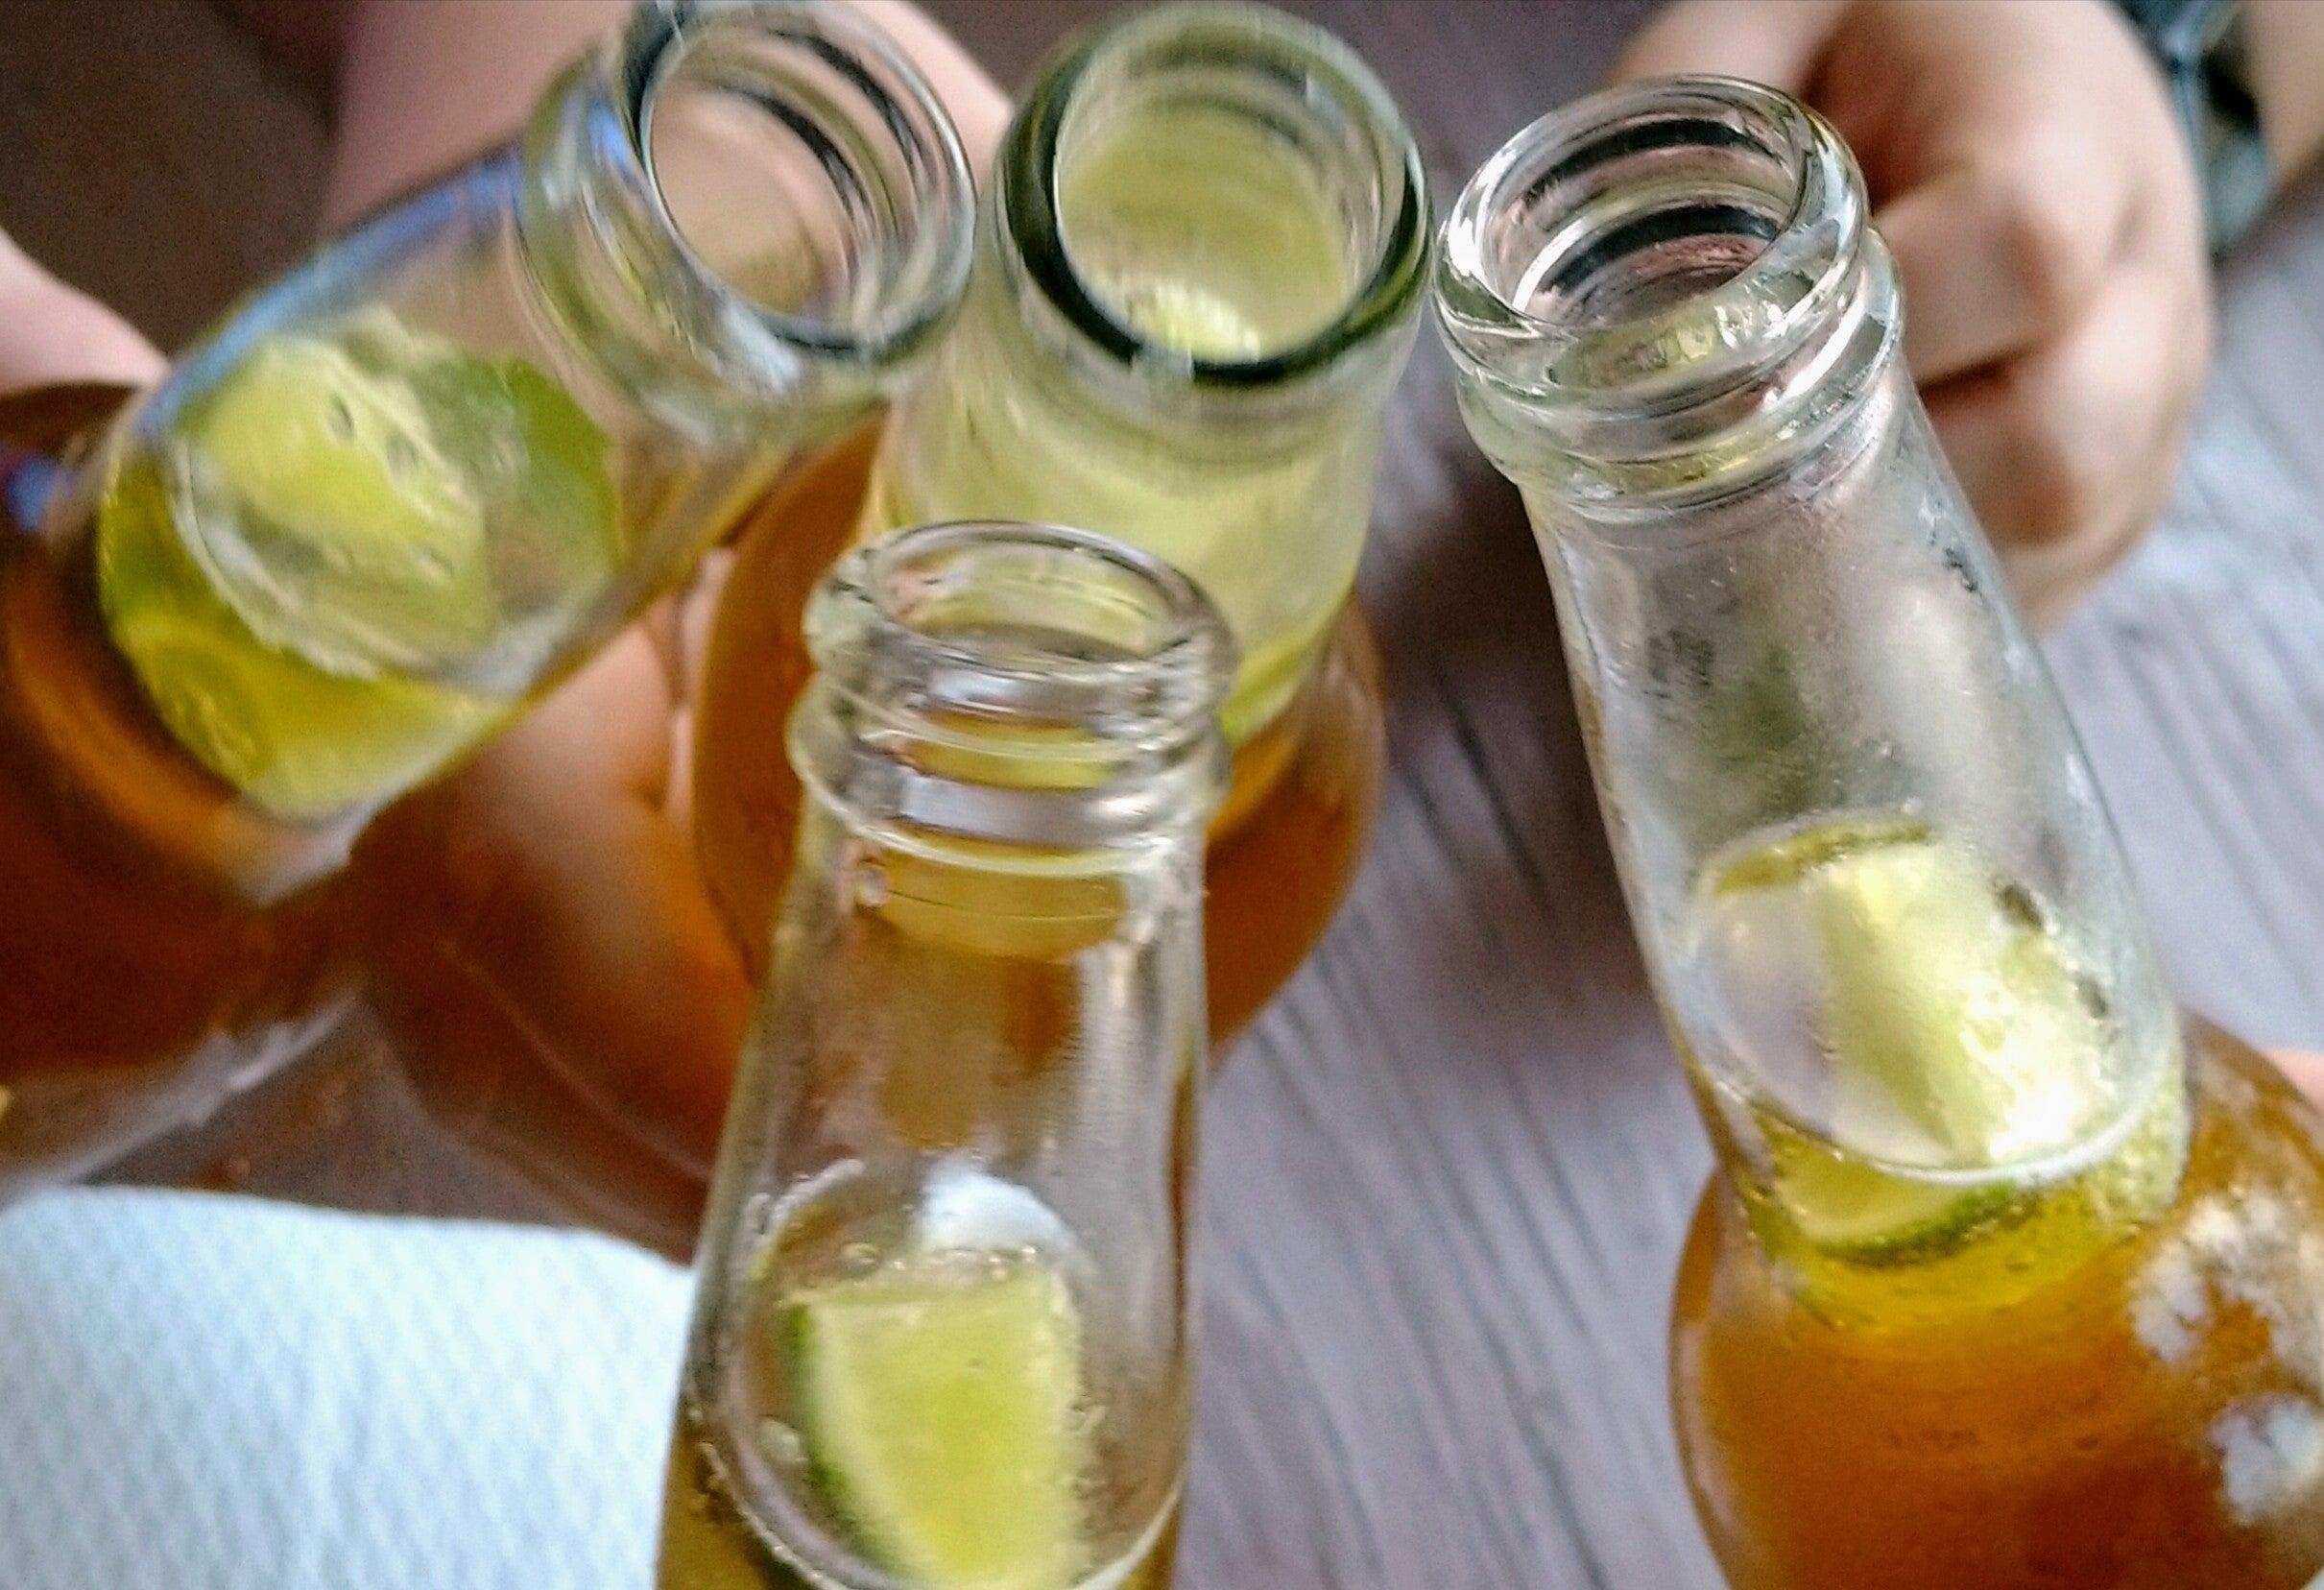 Drinkers Are Confusing Corona Beer With The Coronavirus @themotleyfool #stocks $stz $googl $goog photo